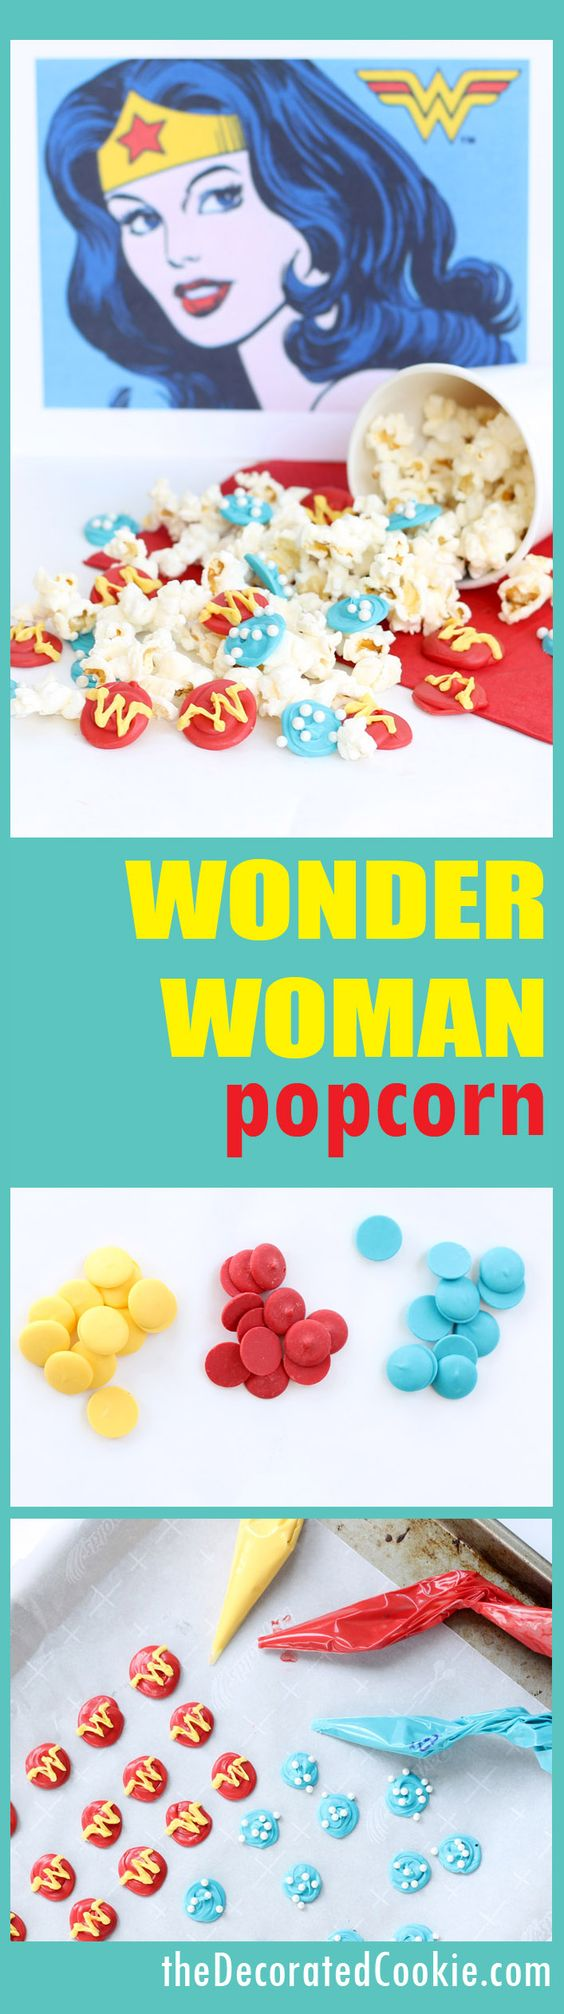 Wonder Woman popcorn -- Superhero party food ideas